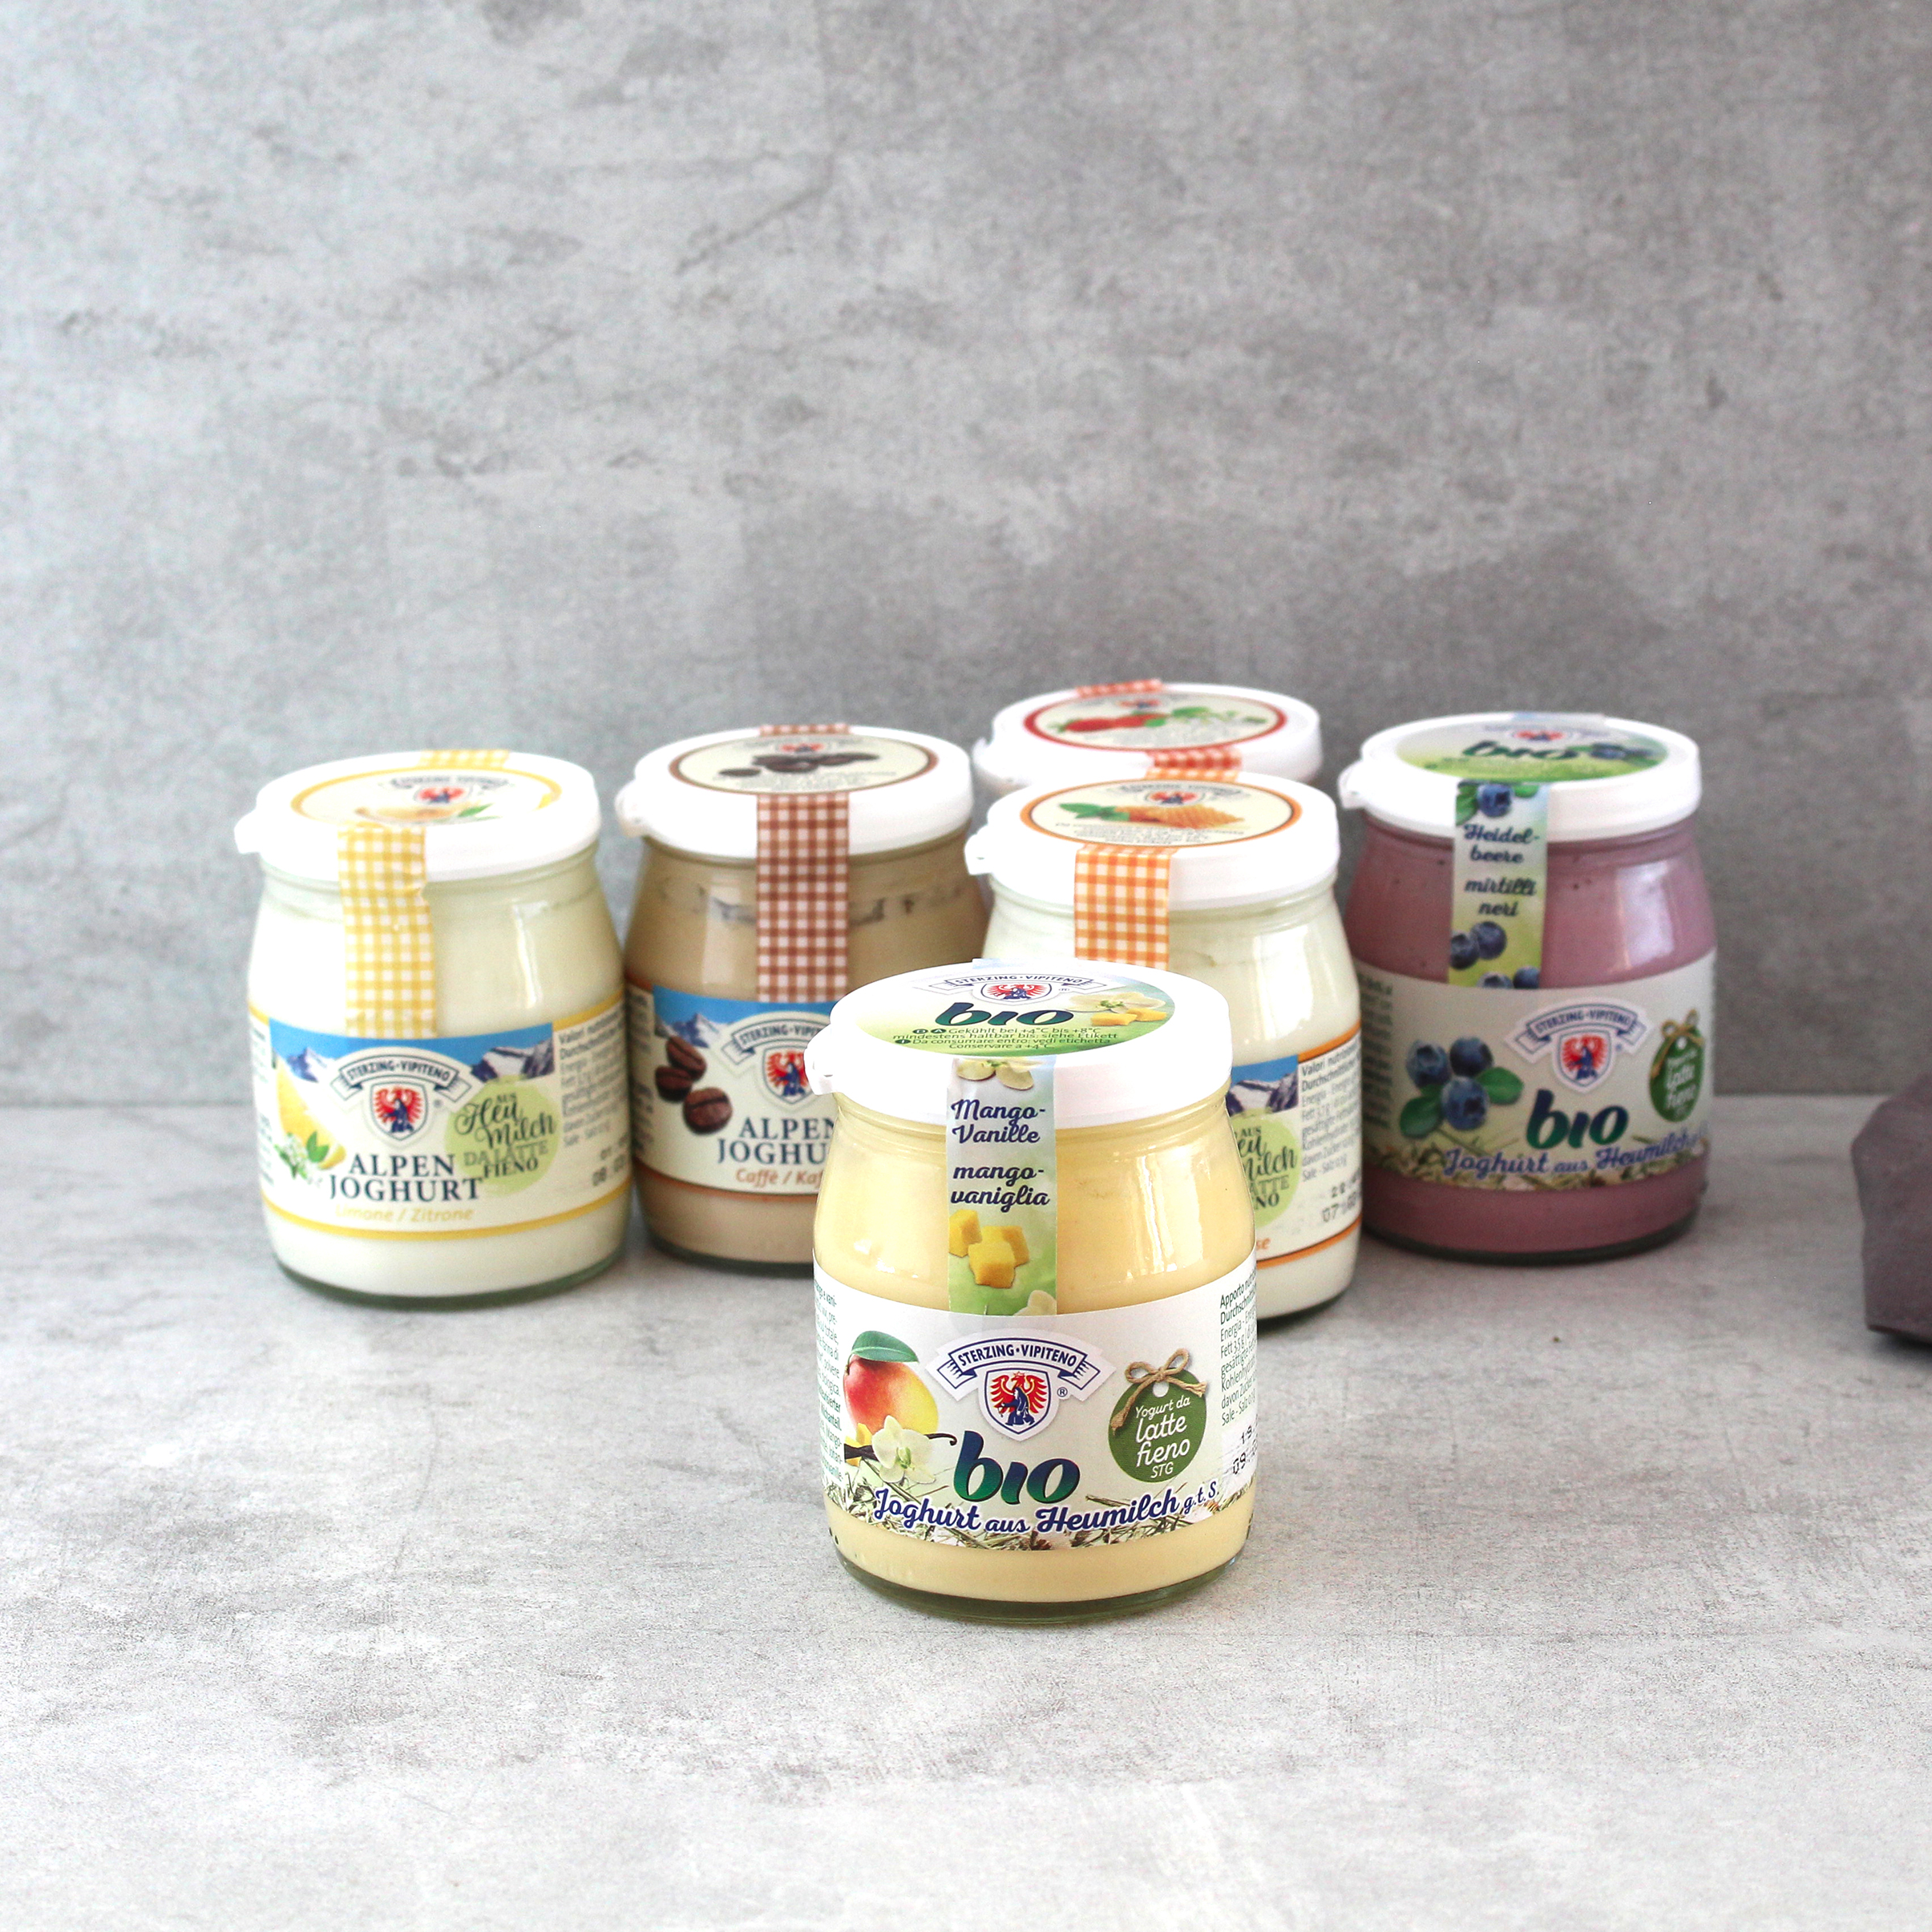 Alpenjoghurt_Mango_Vanille_MH20